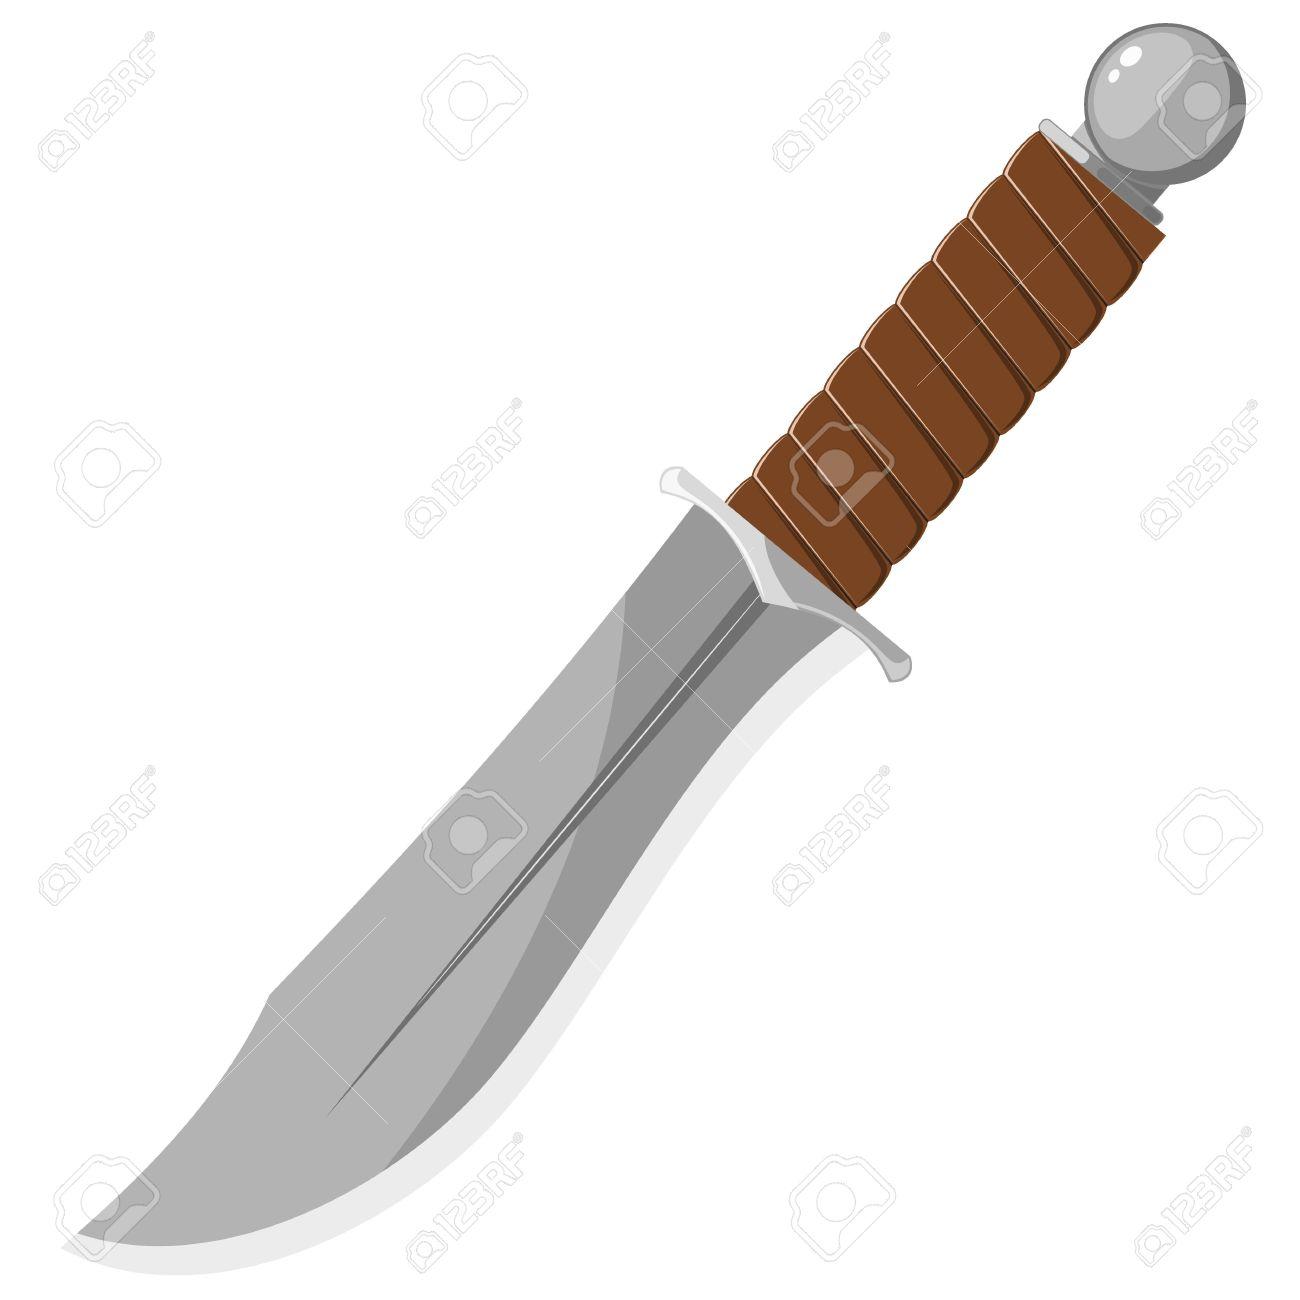 Drawn dagger military knife Knife Sharp Clipart of Knife